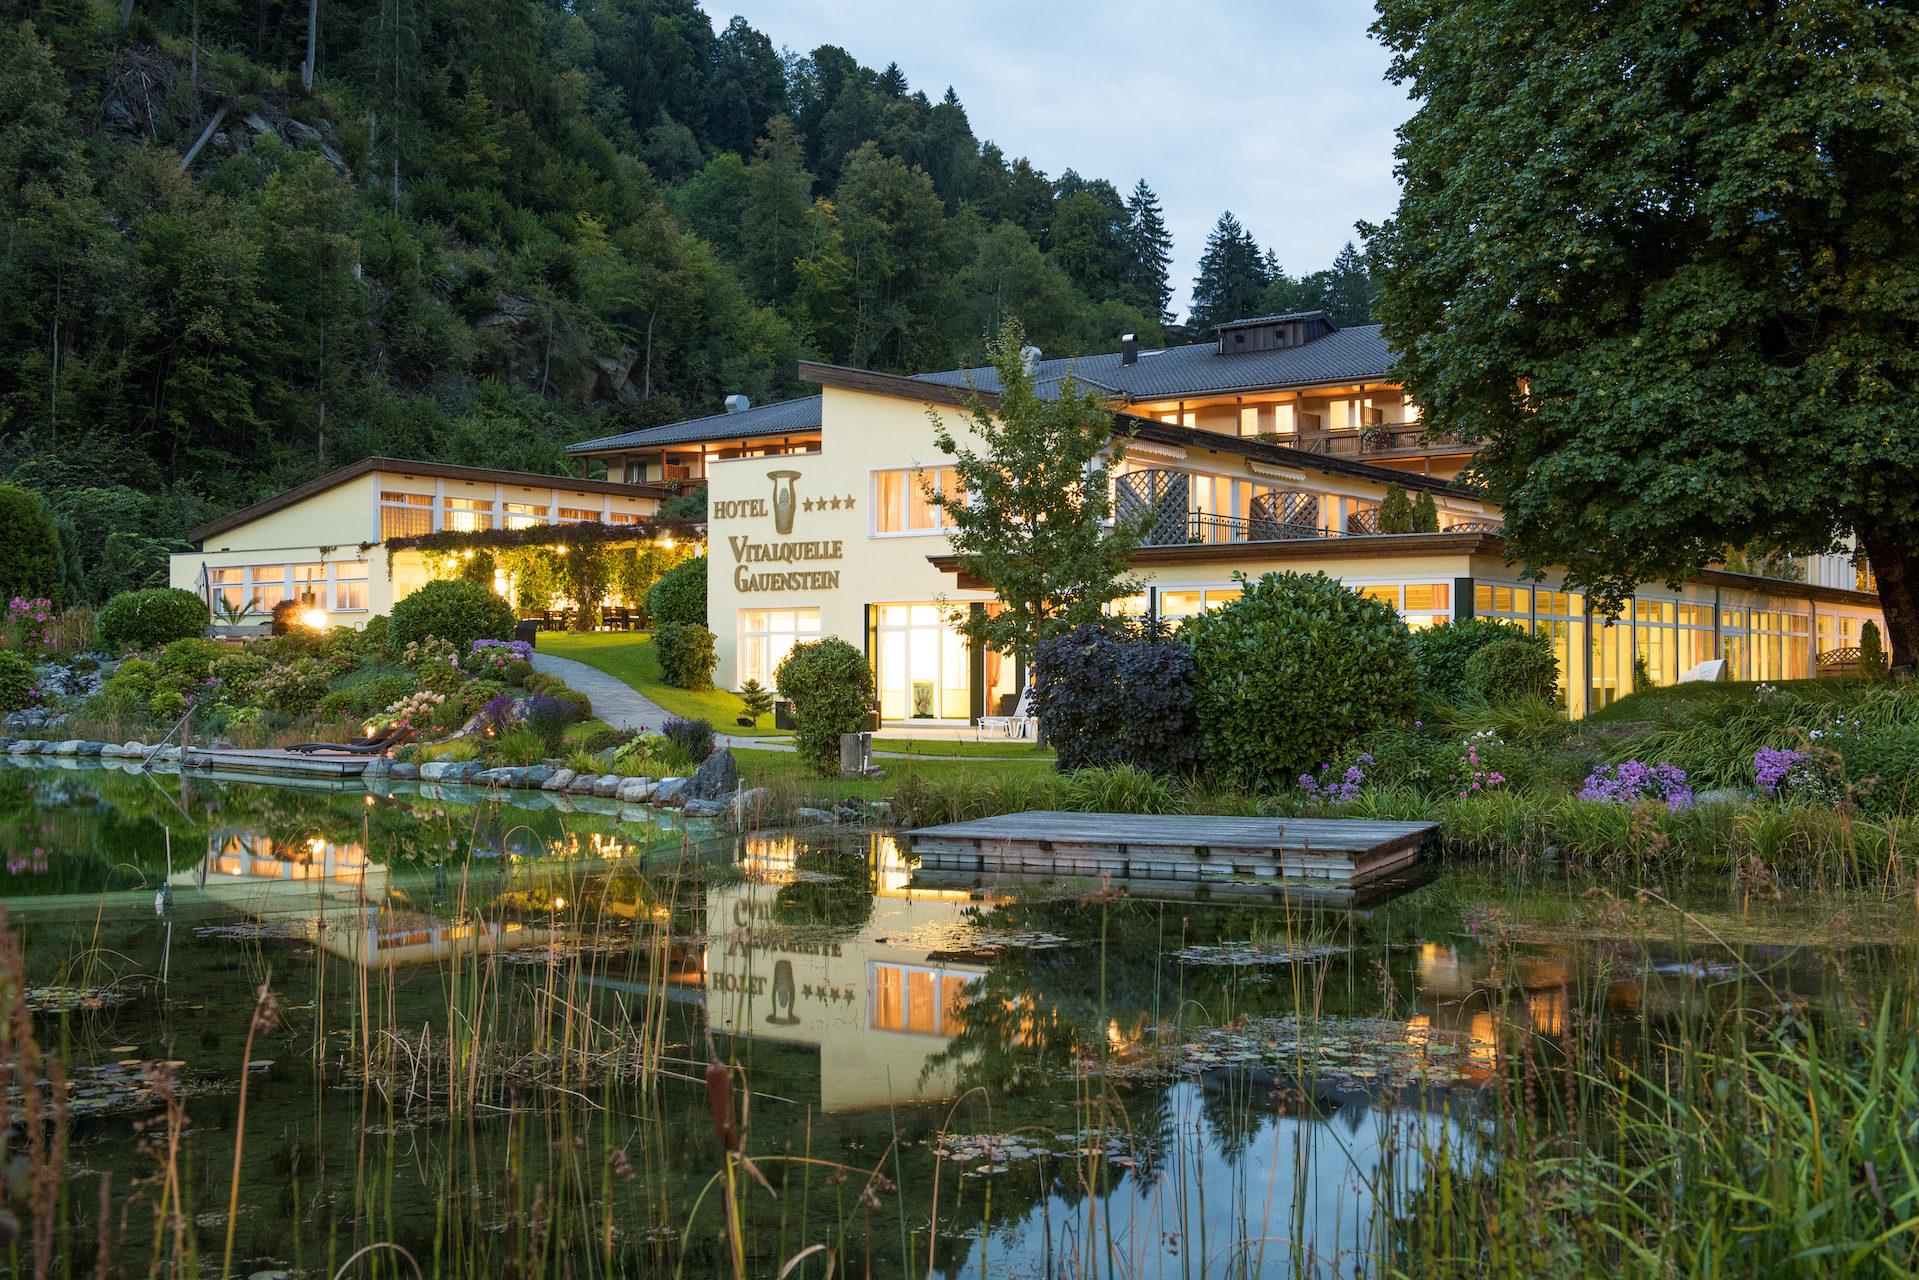 Hotel Vitalquelle Schruns Montafon